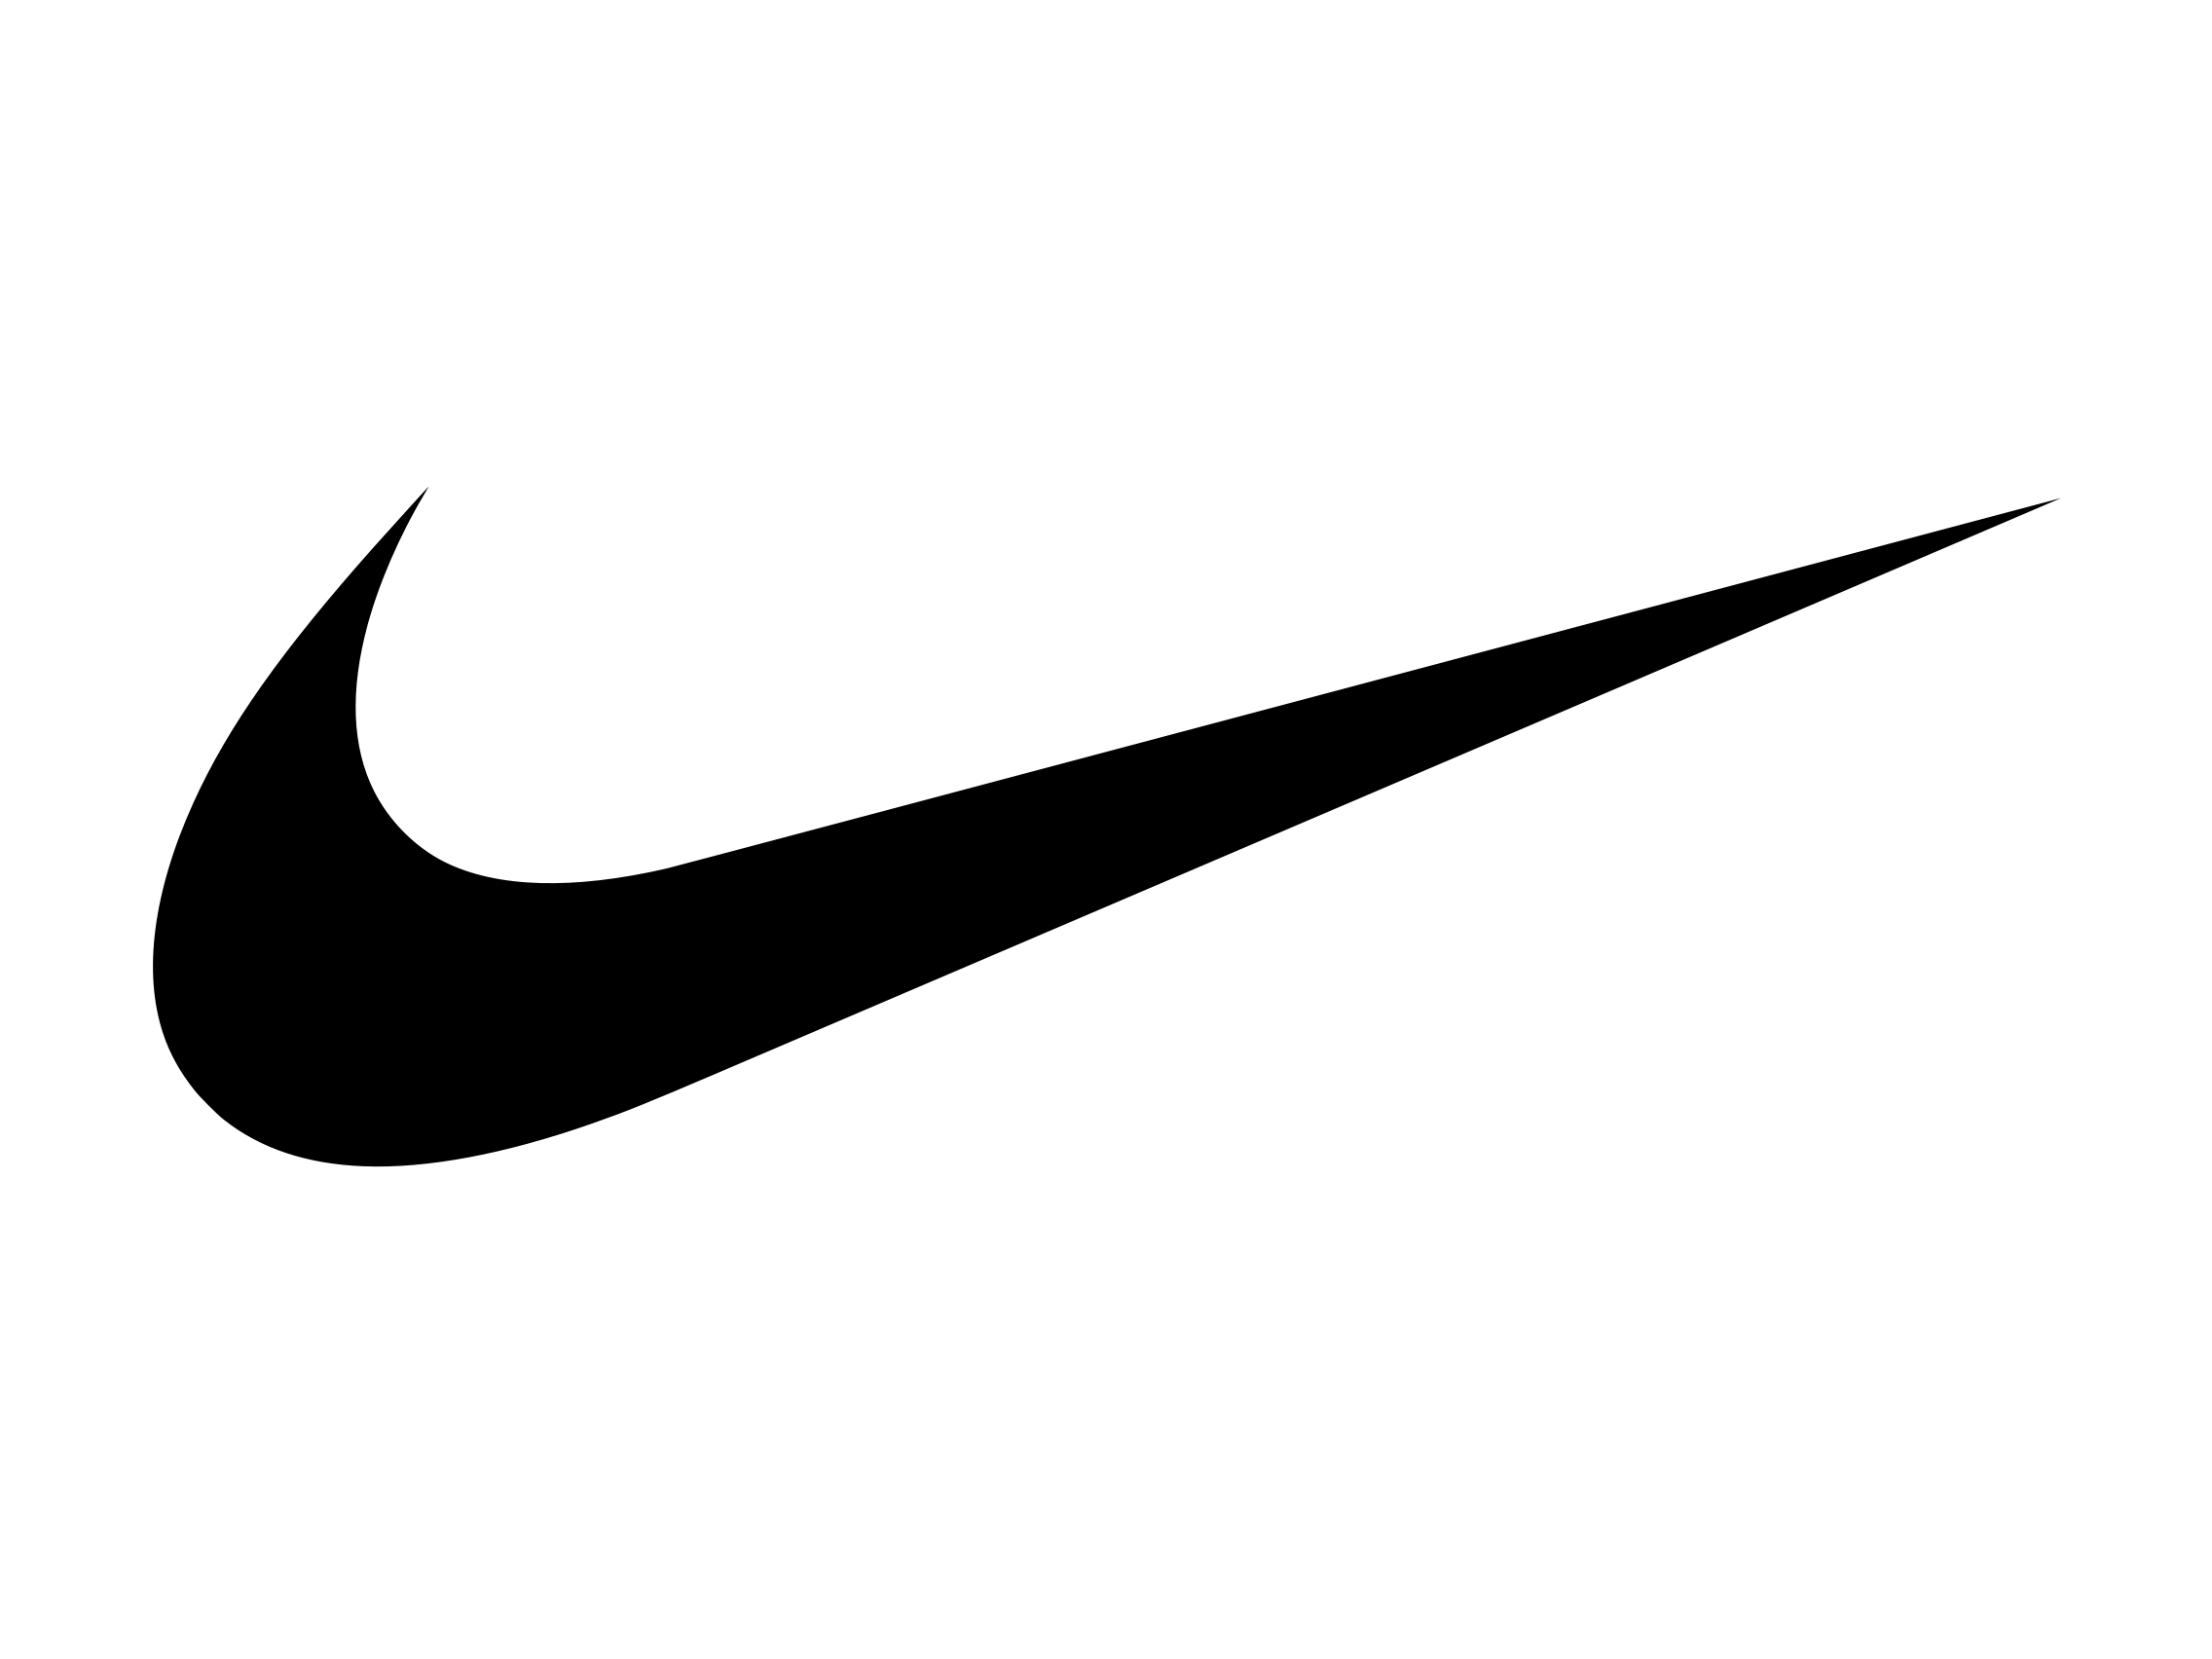 nike transparent logos background